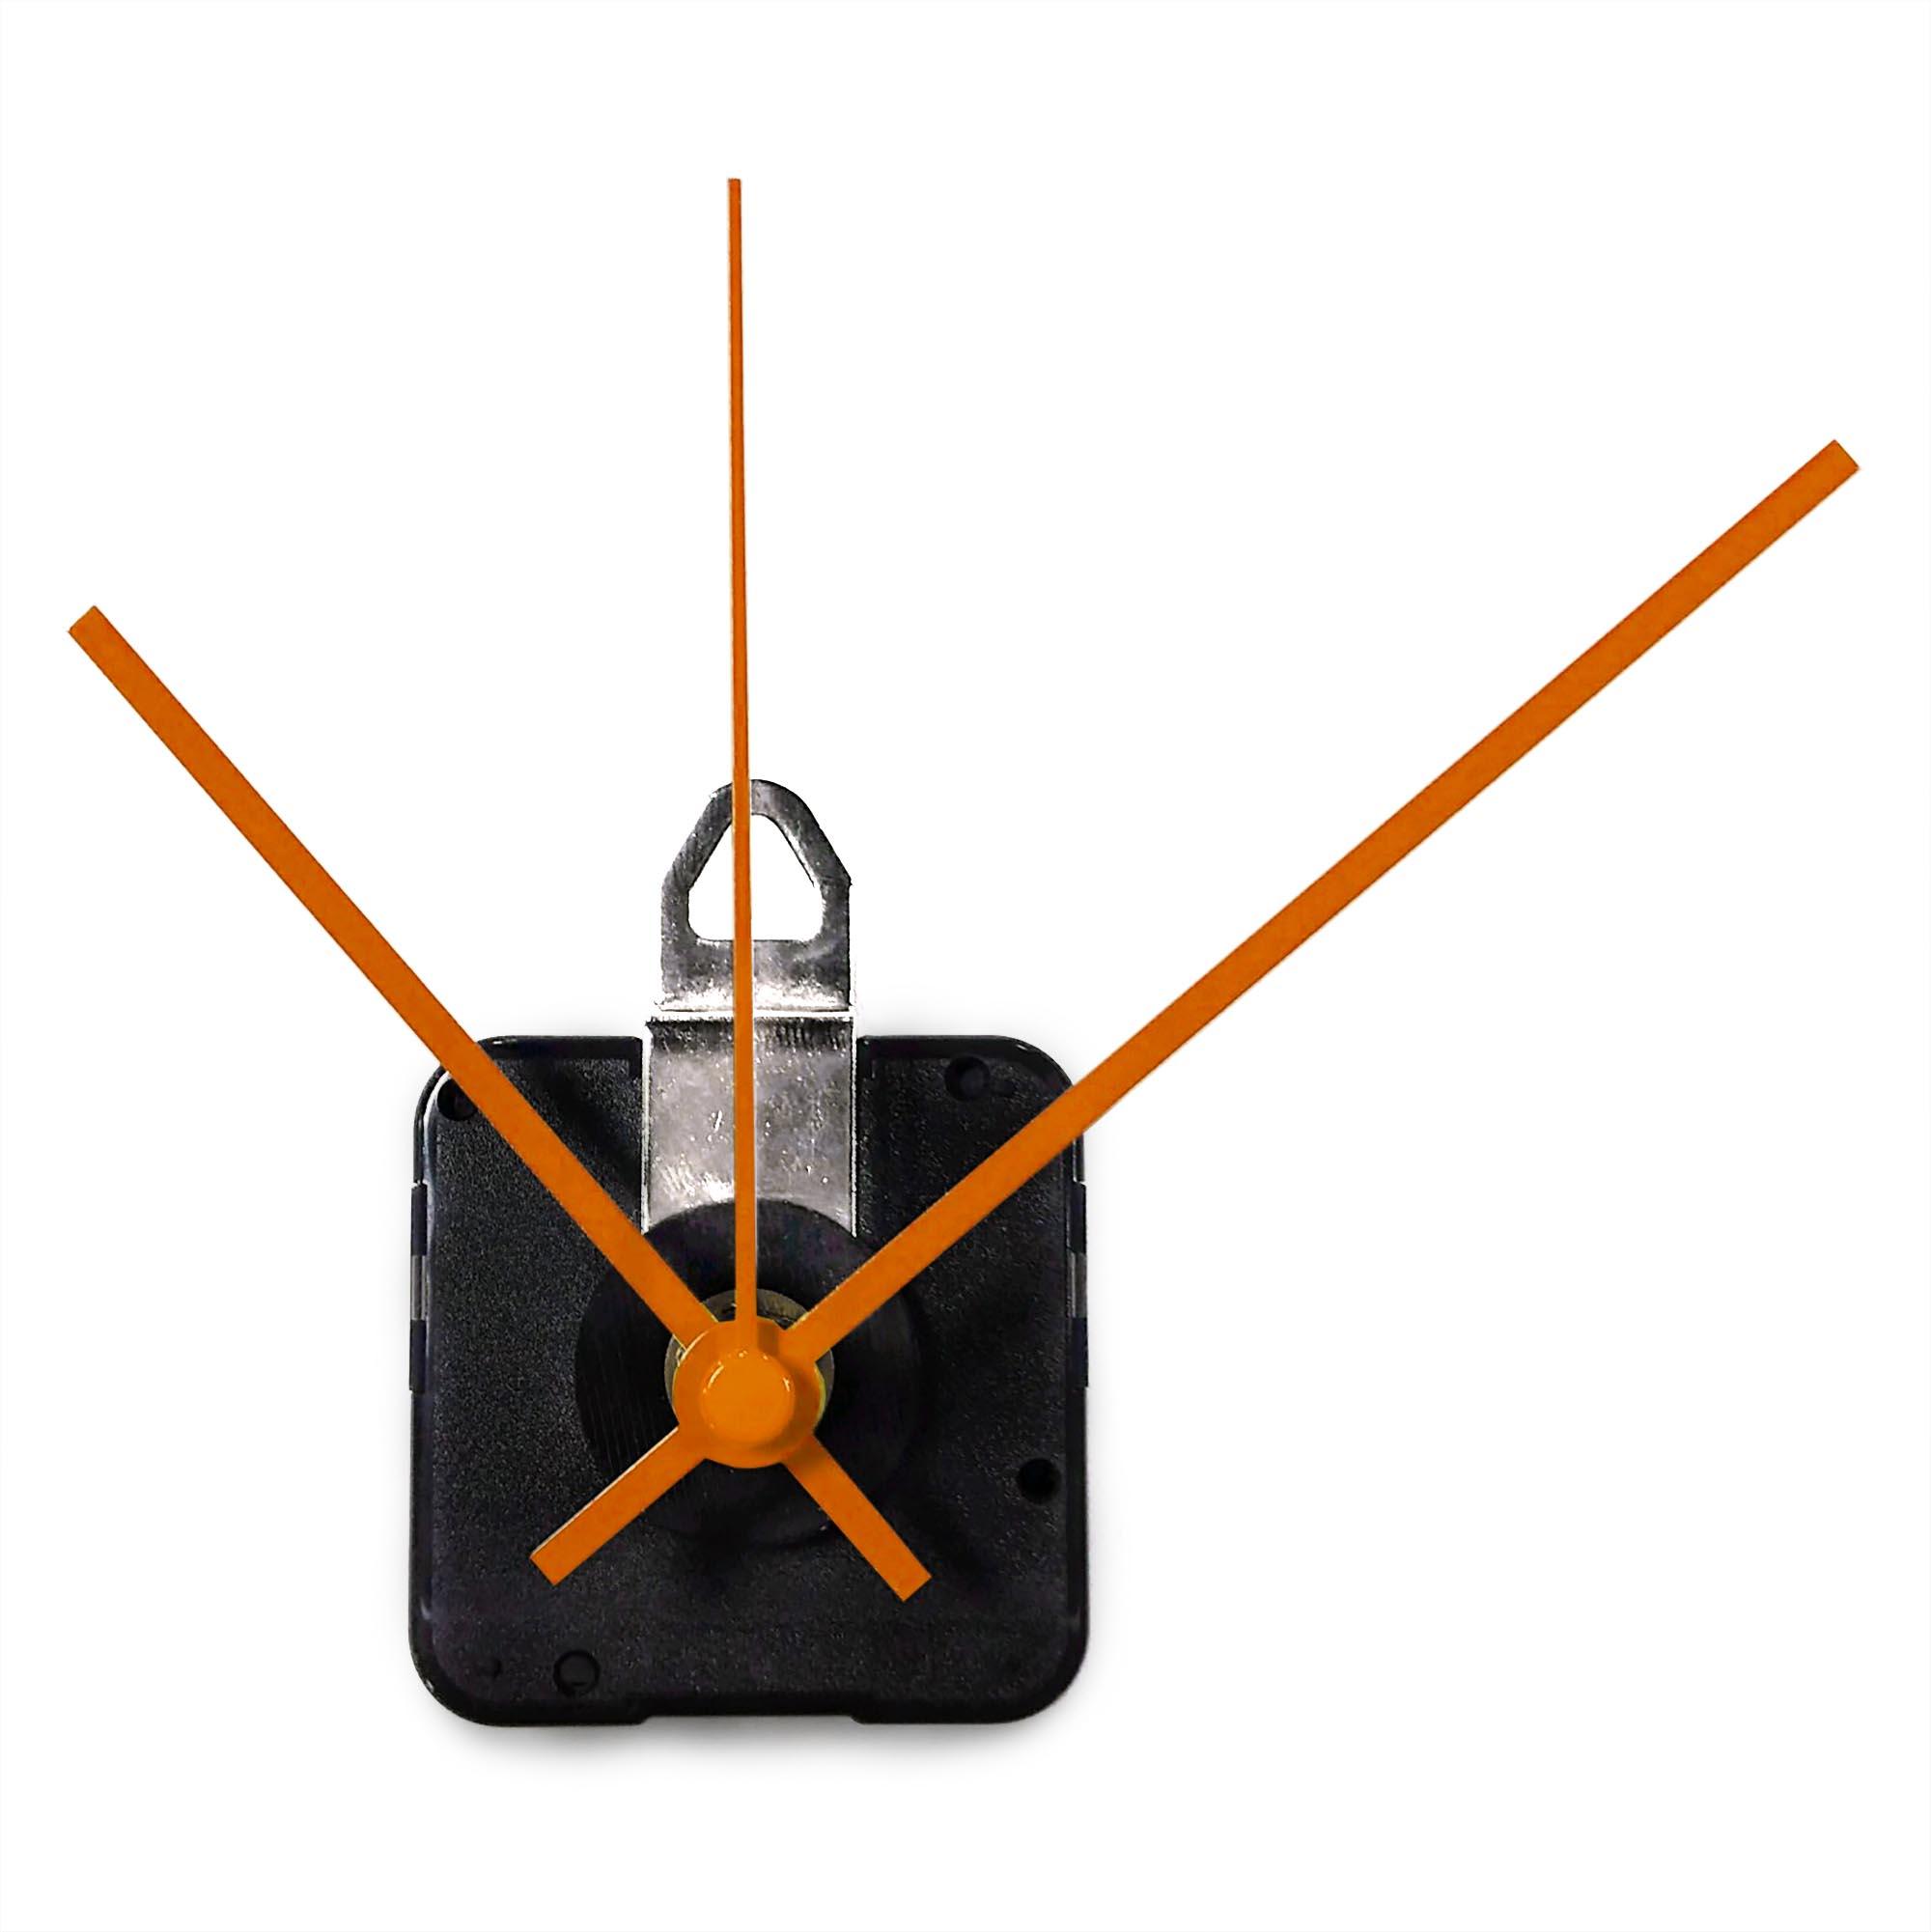 Replacement Clock Motor & Hands Set | Continuous-Sweep, High-Torque Mini Quartz Movement (Modern Style Hands) - AC0001-MOD